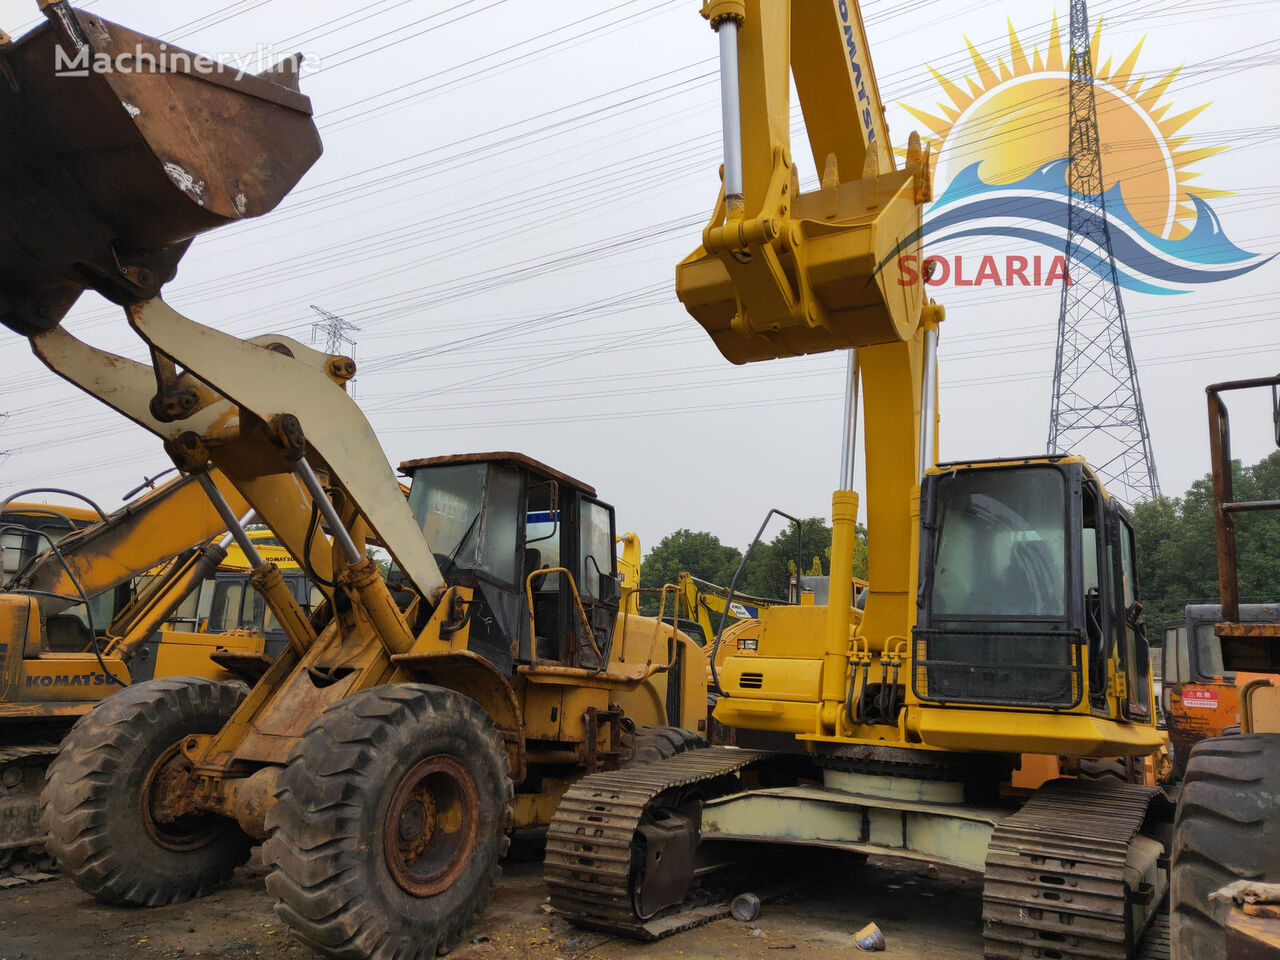 KOMATSU PC270-7 tracked excavator